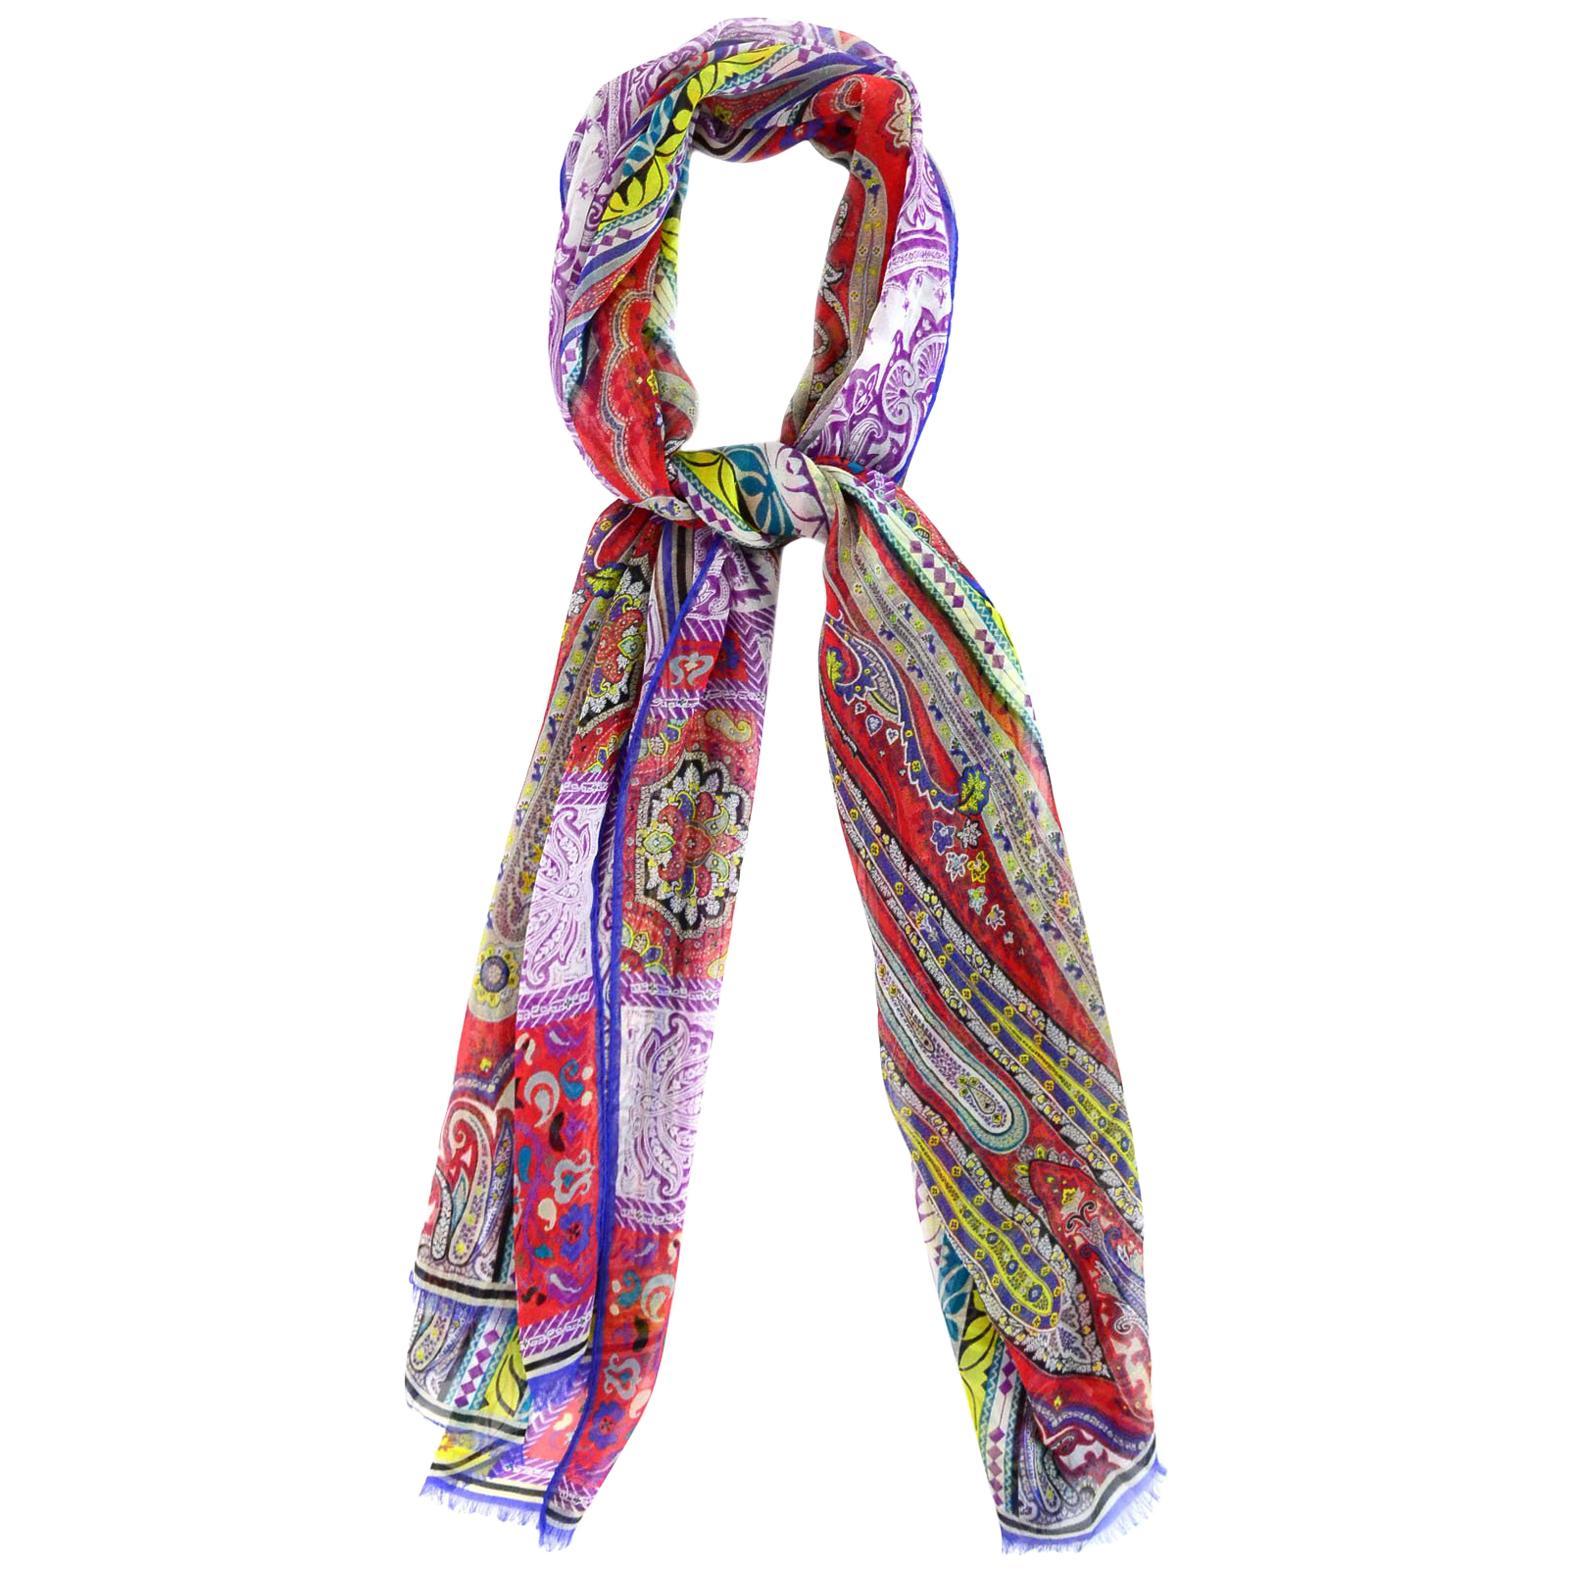 Etro Multi-Color Sheer Silk Paisley Print Scarf